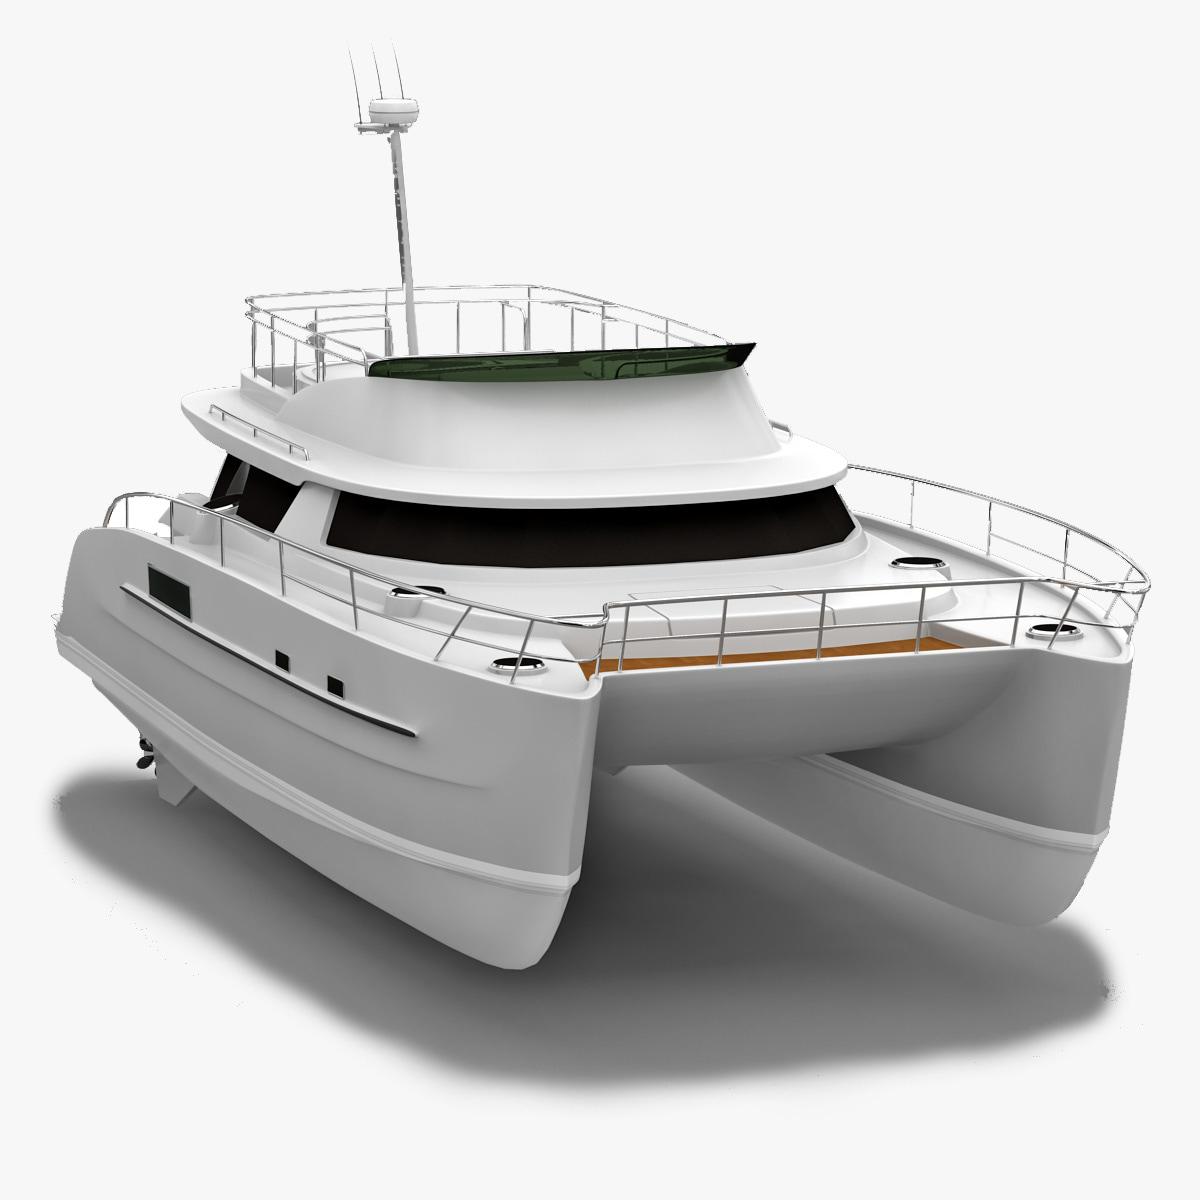 Cruise_Catamaran_Cumberland_44_000.jpg